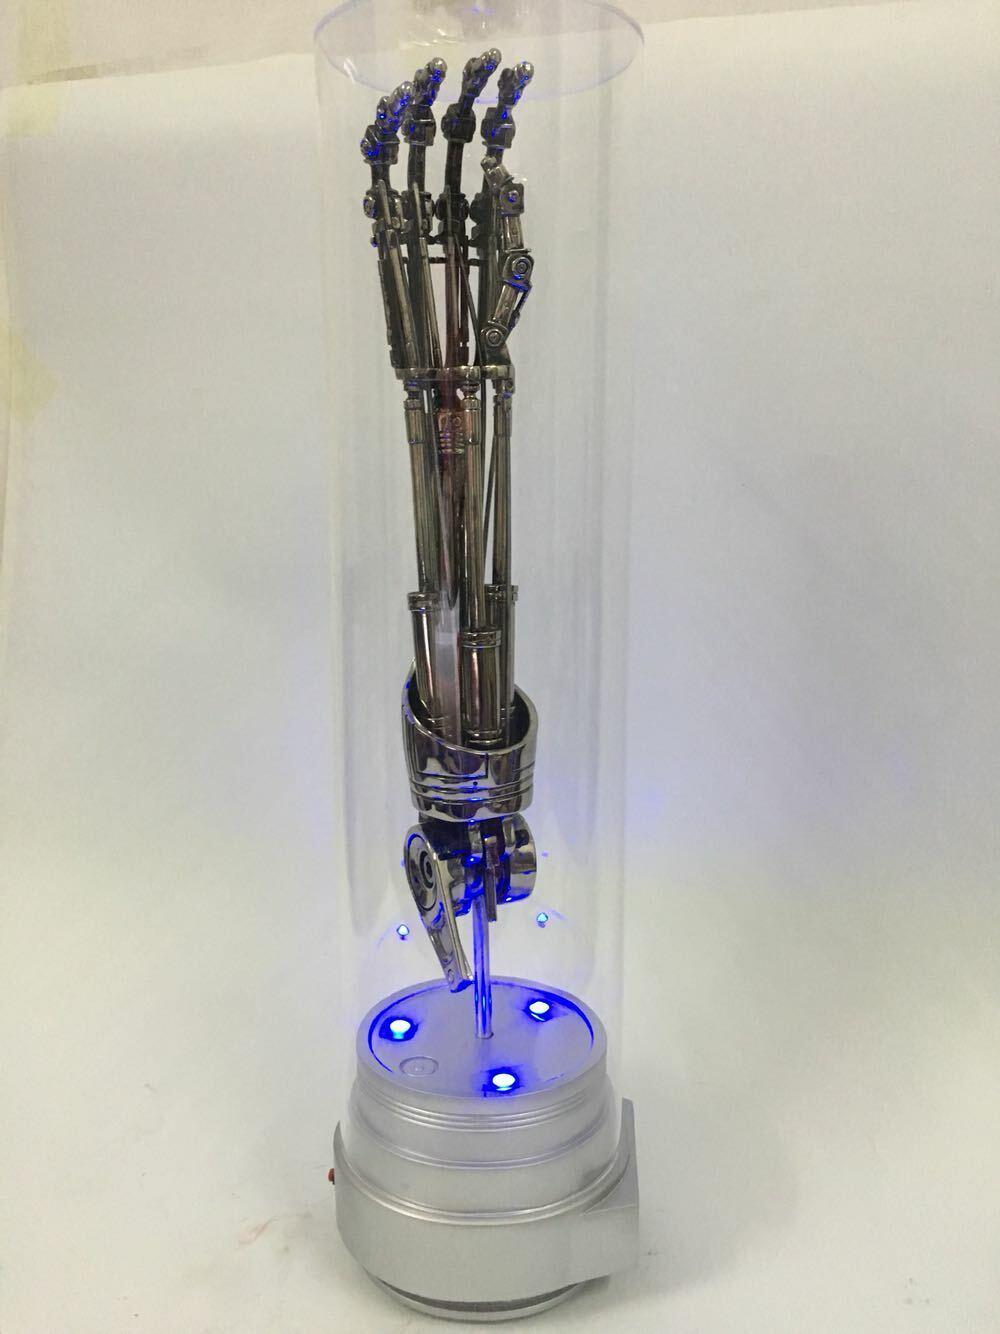 Terminator 2 T800 Endoarm 1  1 liv -Storlek Arm Endoskeleton modellllerlerl Staty Prop